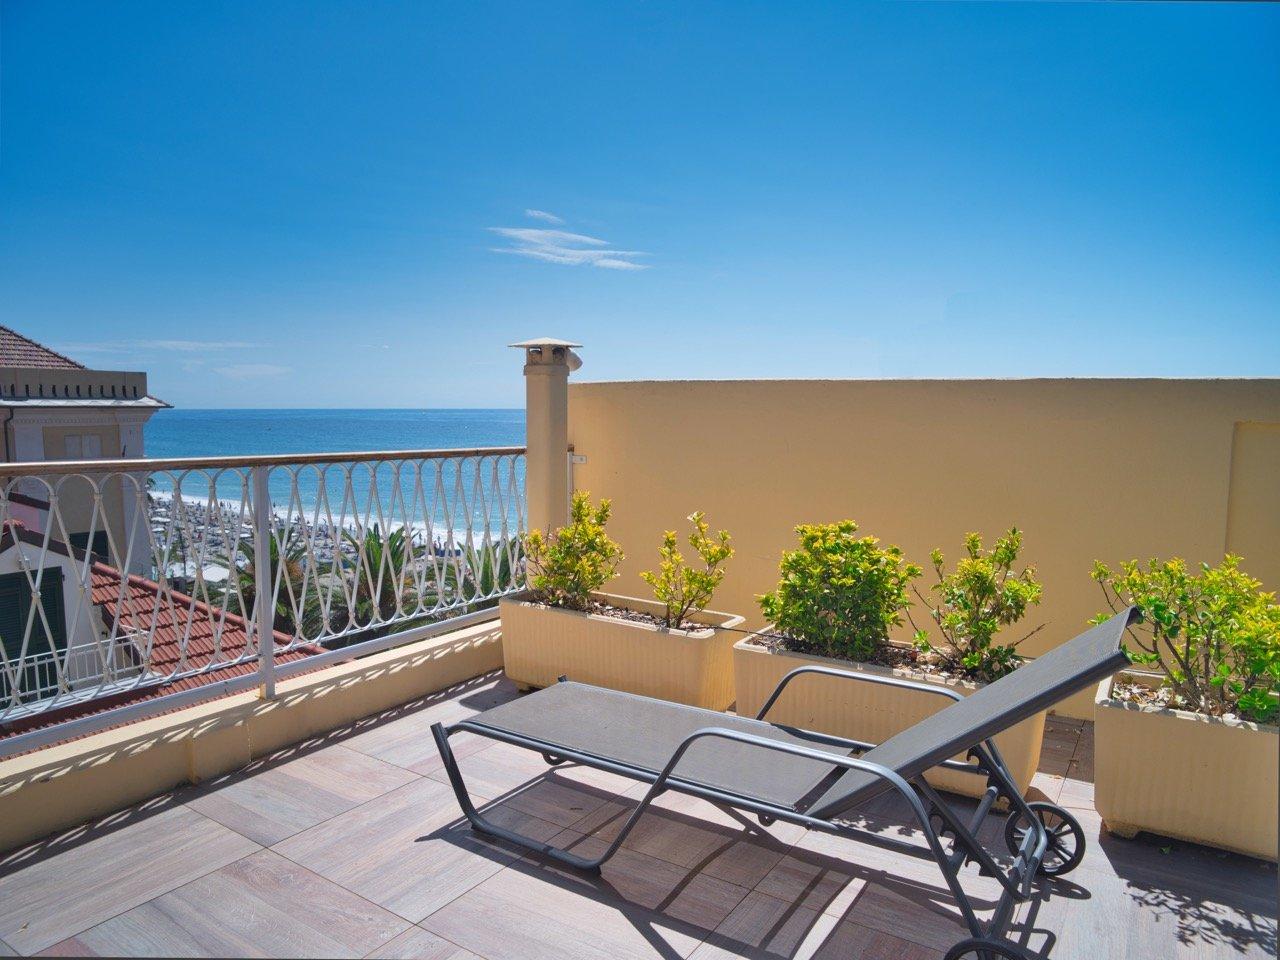 Hotel Medusa Finale Ligure terrazza solarium vista mare